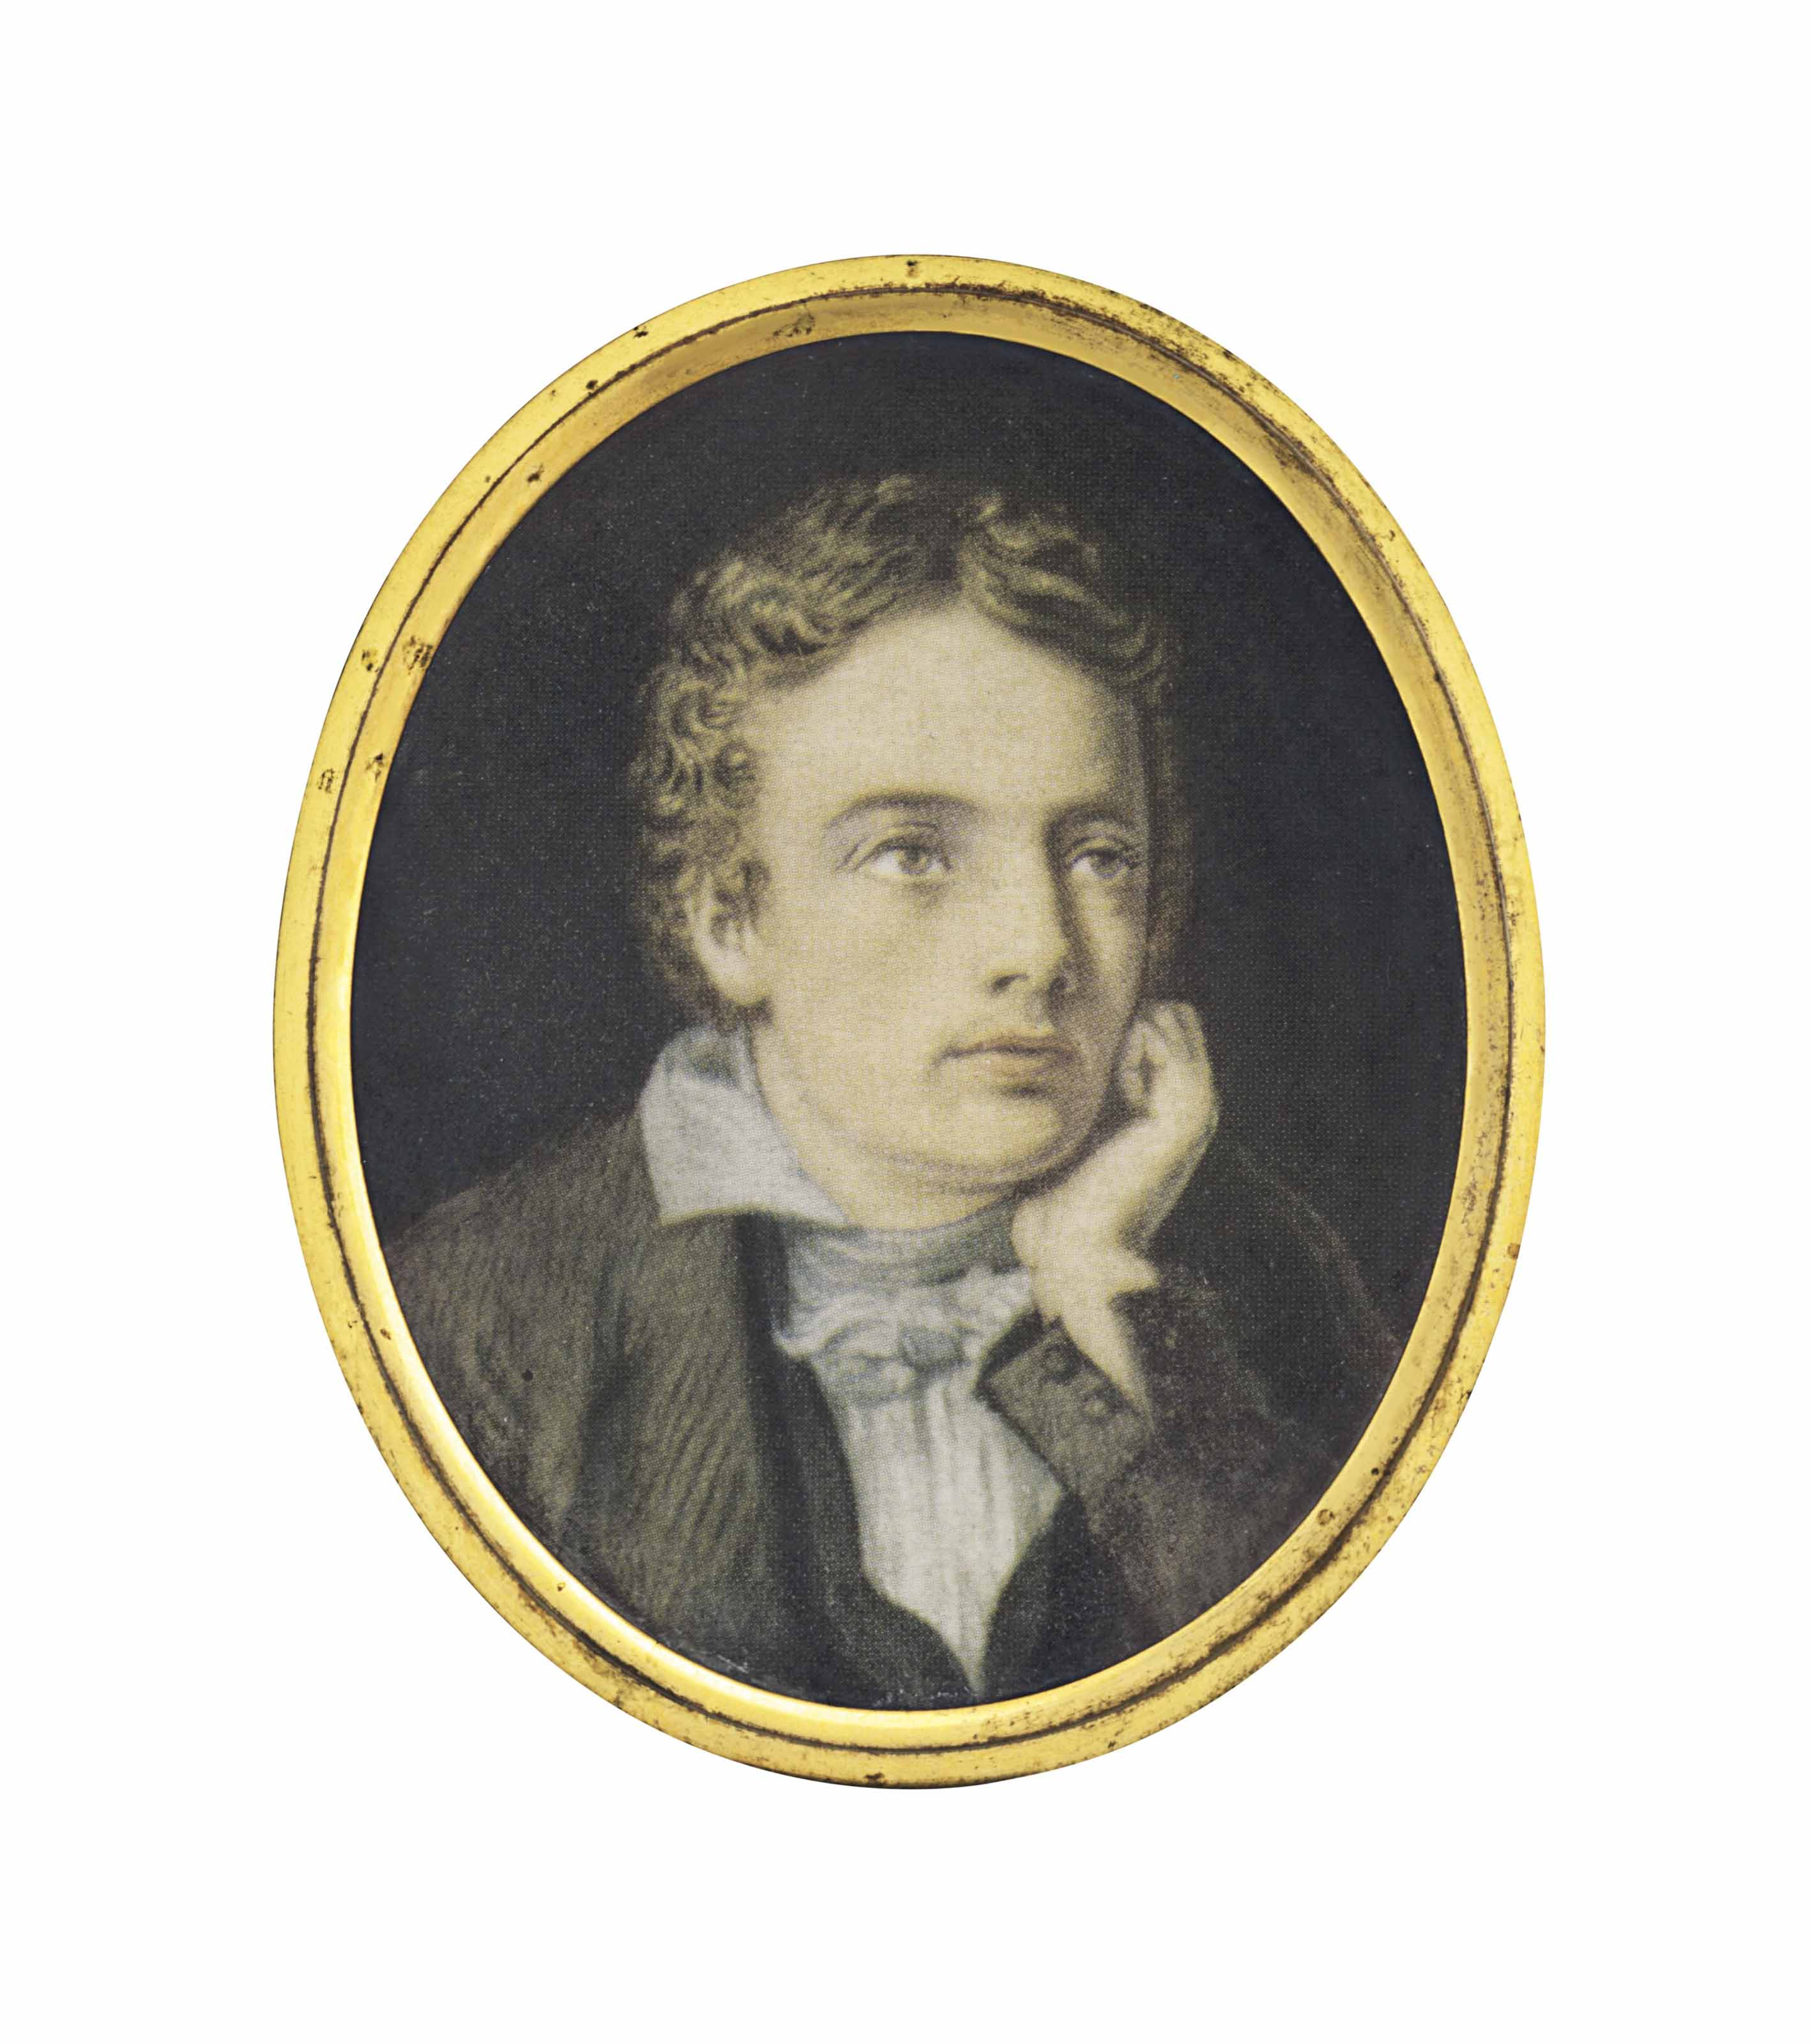 AFTER JOSEPH SEVERN (BRITISH, 1793-1879)